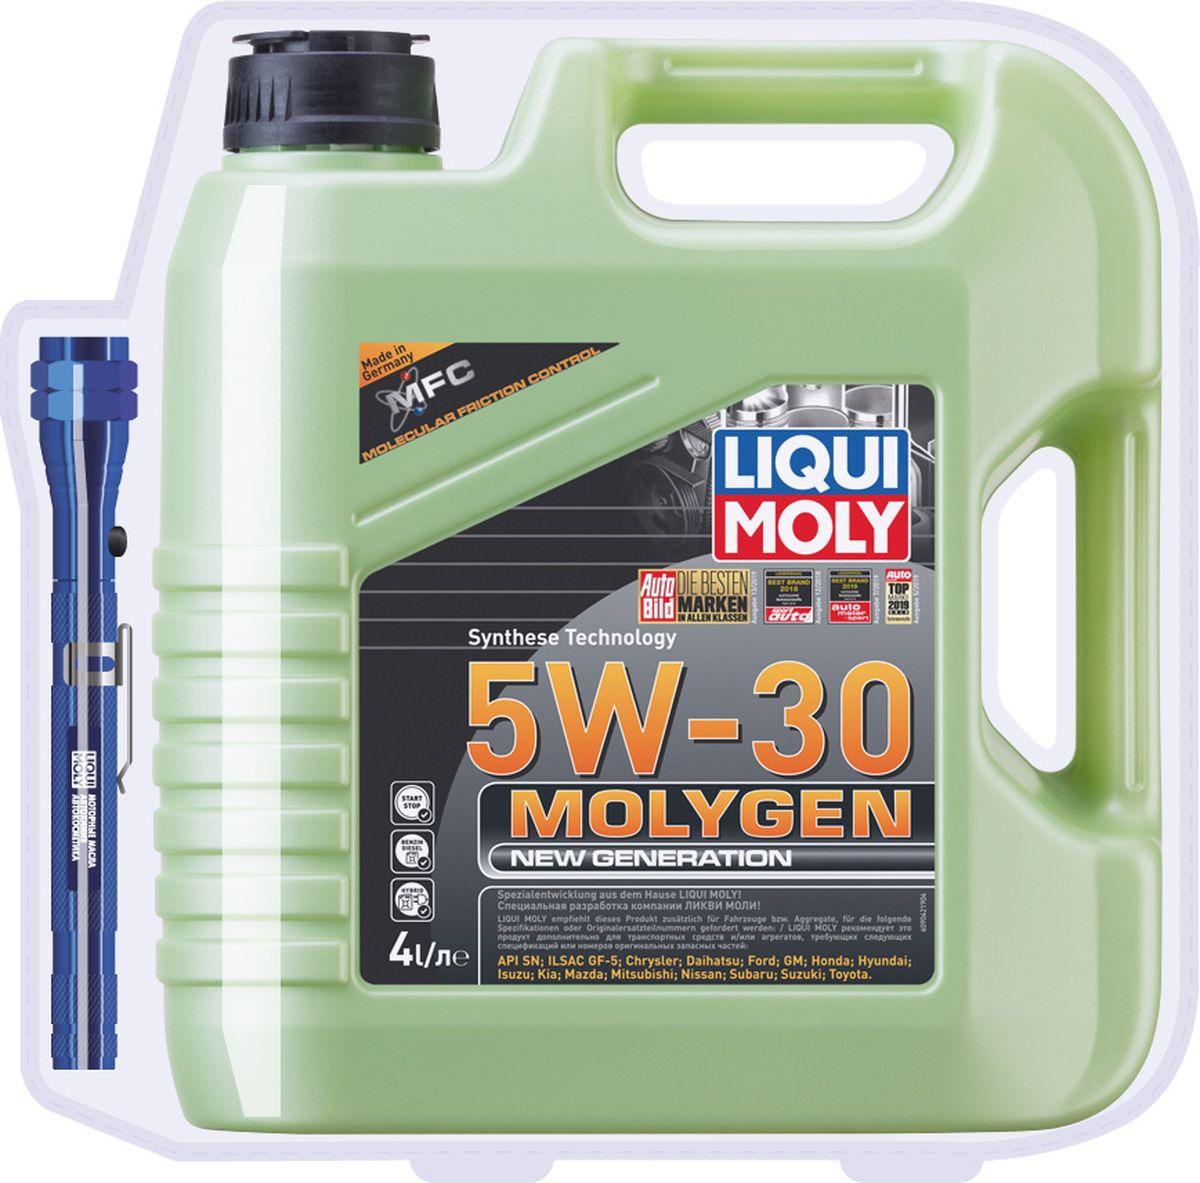 Моторное масло Liqui Moly Molygen New Generation, НС-синтетическое, 5W-30, 4 л + Фонарик в подарок 9042d liquimoly нс синт мот масло molygen new generation 5w 30 4л фонарик арт 7520r